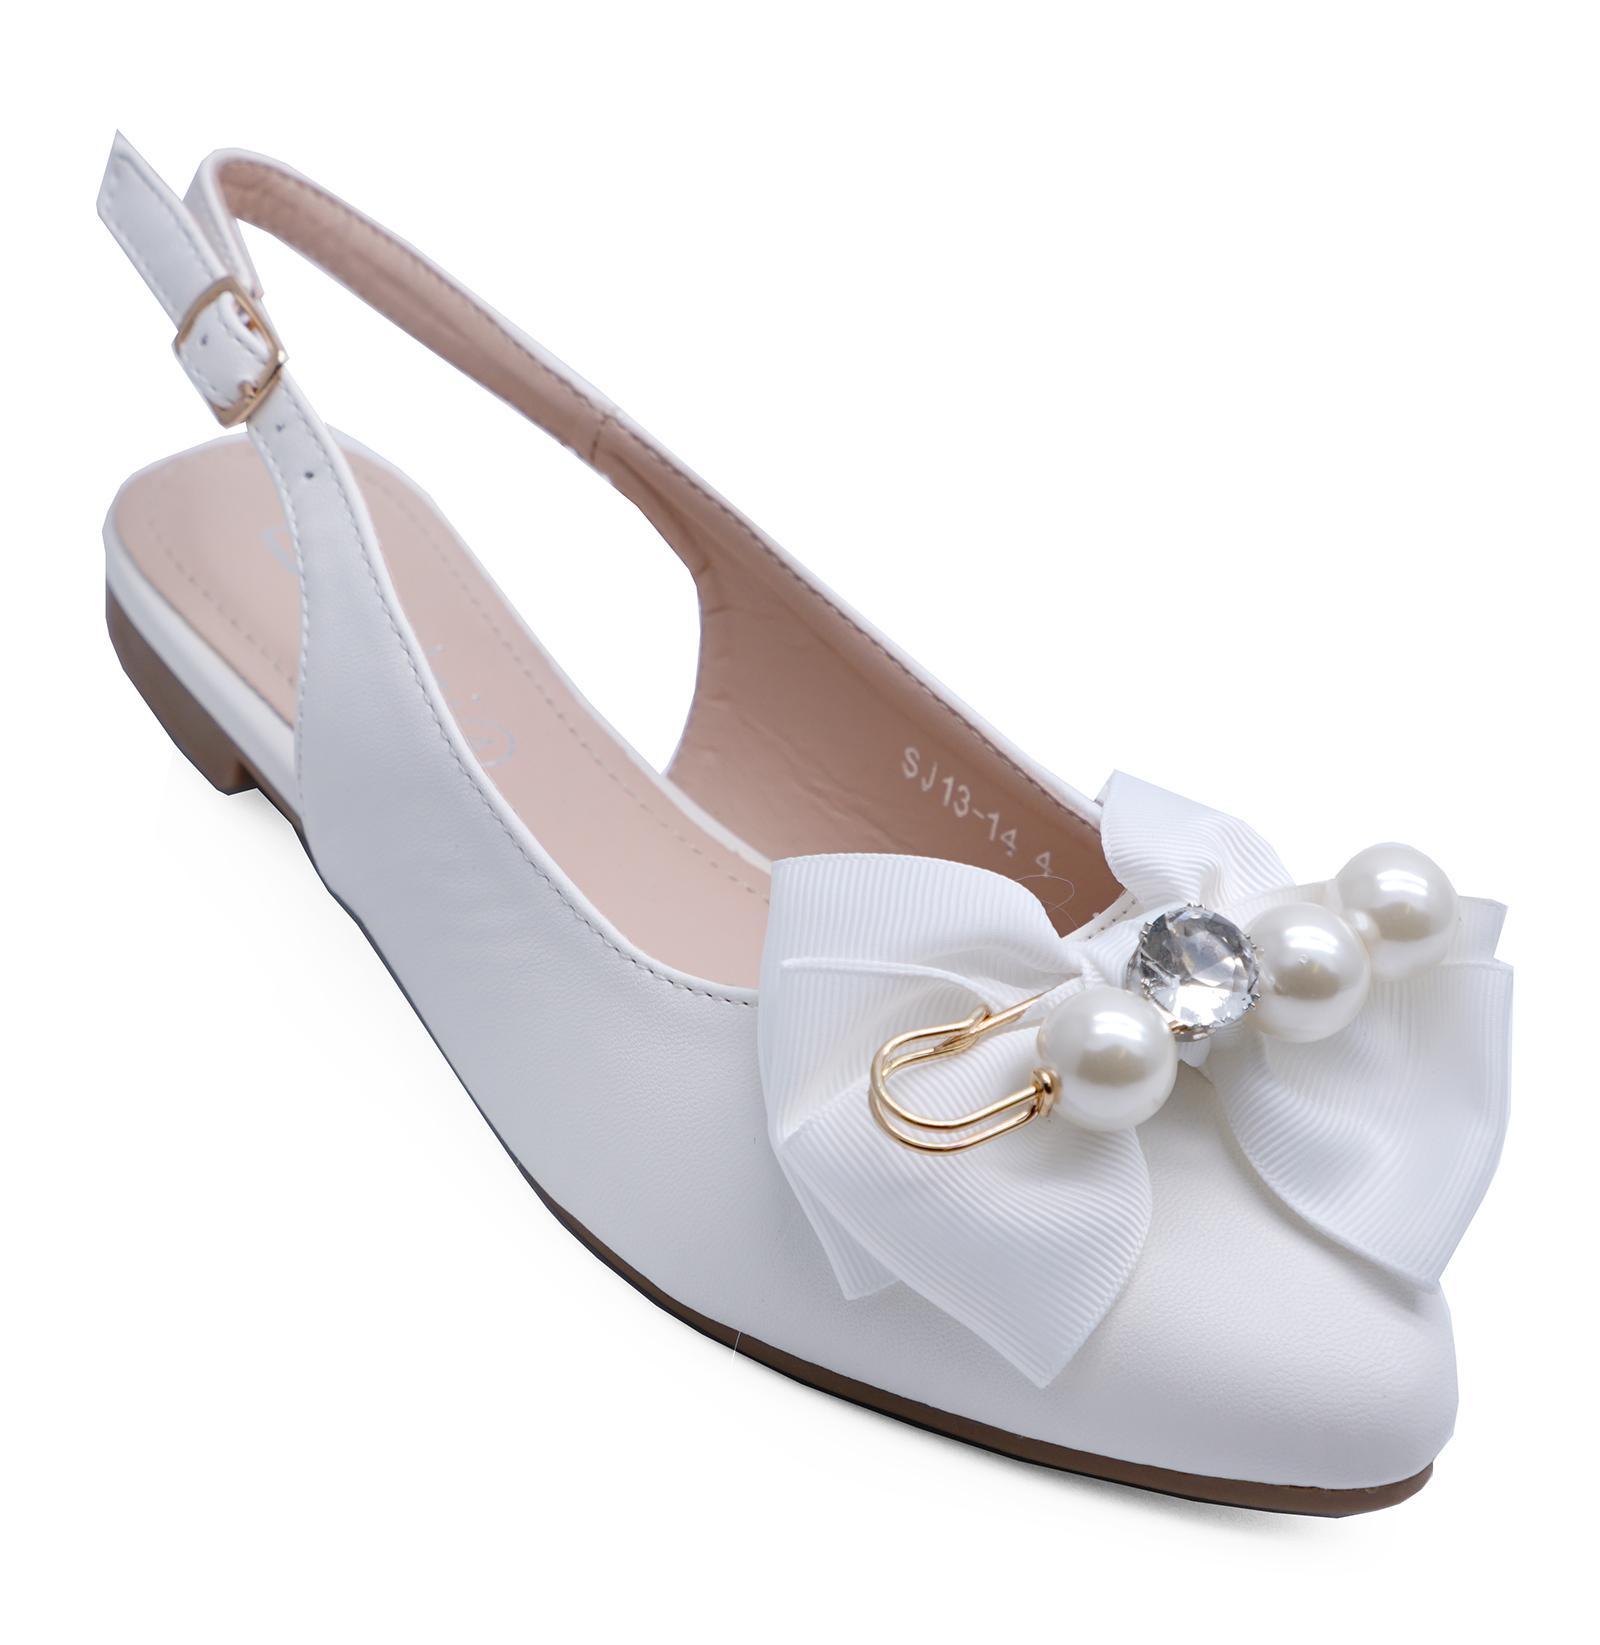 LADIES FLAT WHITE WEDDING BRIDAL BRIDESMAID BRIDE COMFY PRETTY SHOES SIZES 3-8